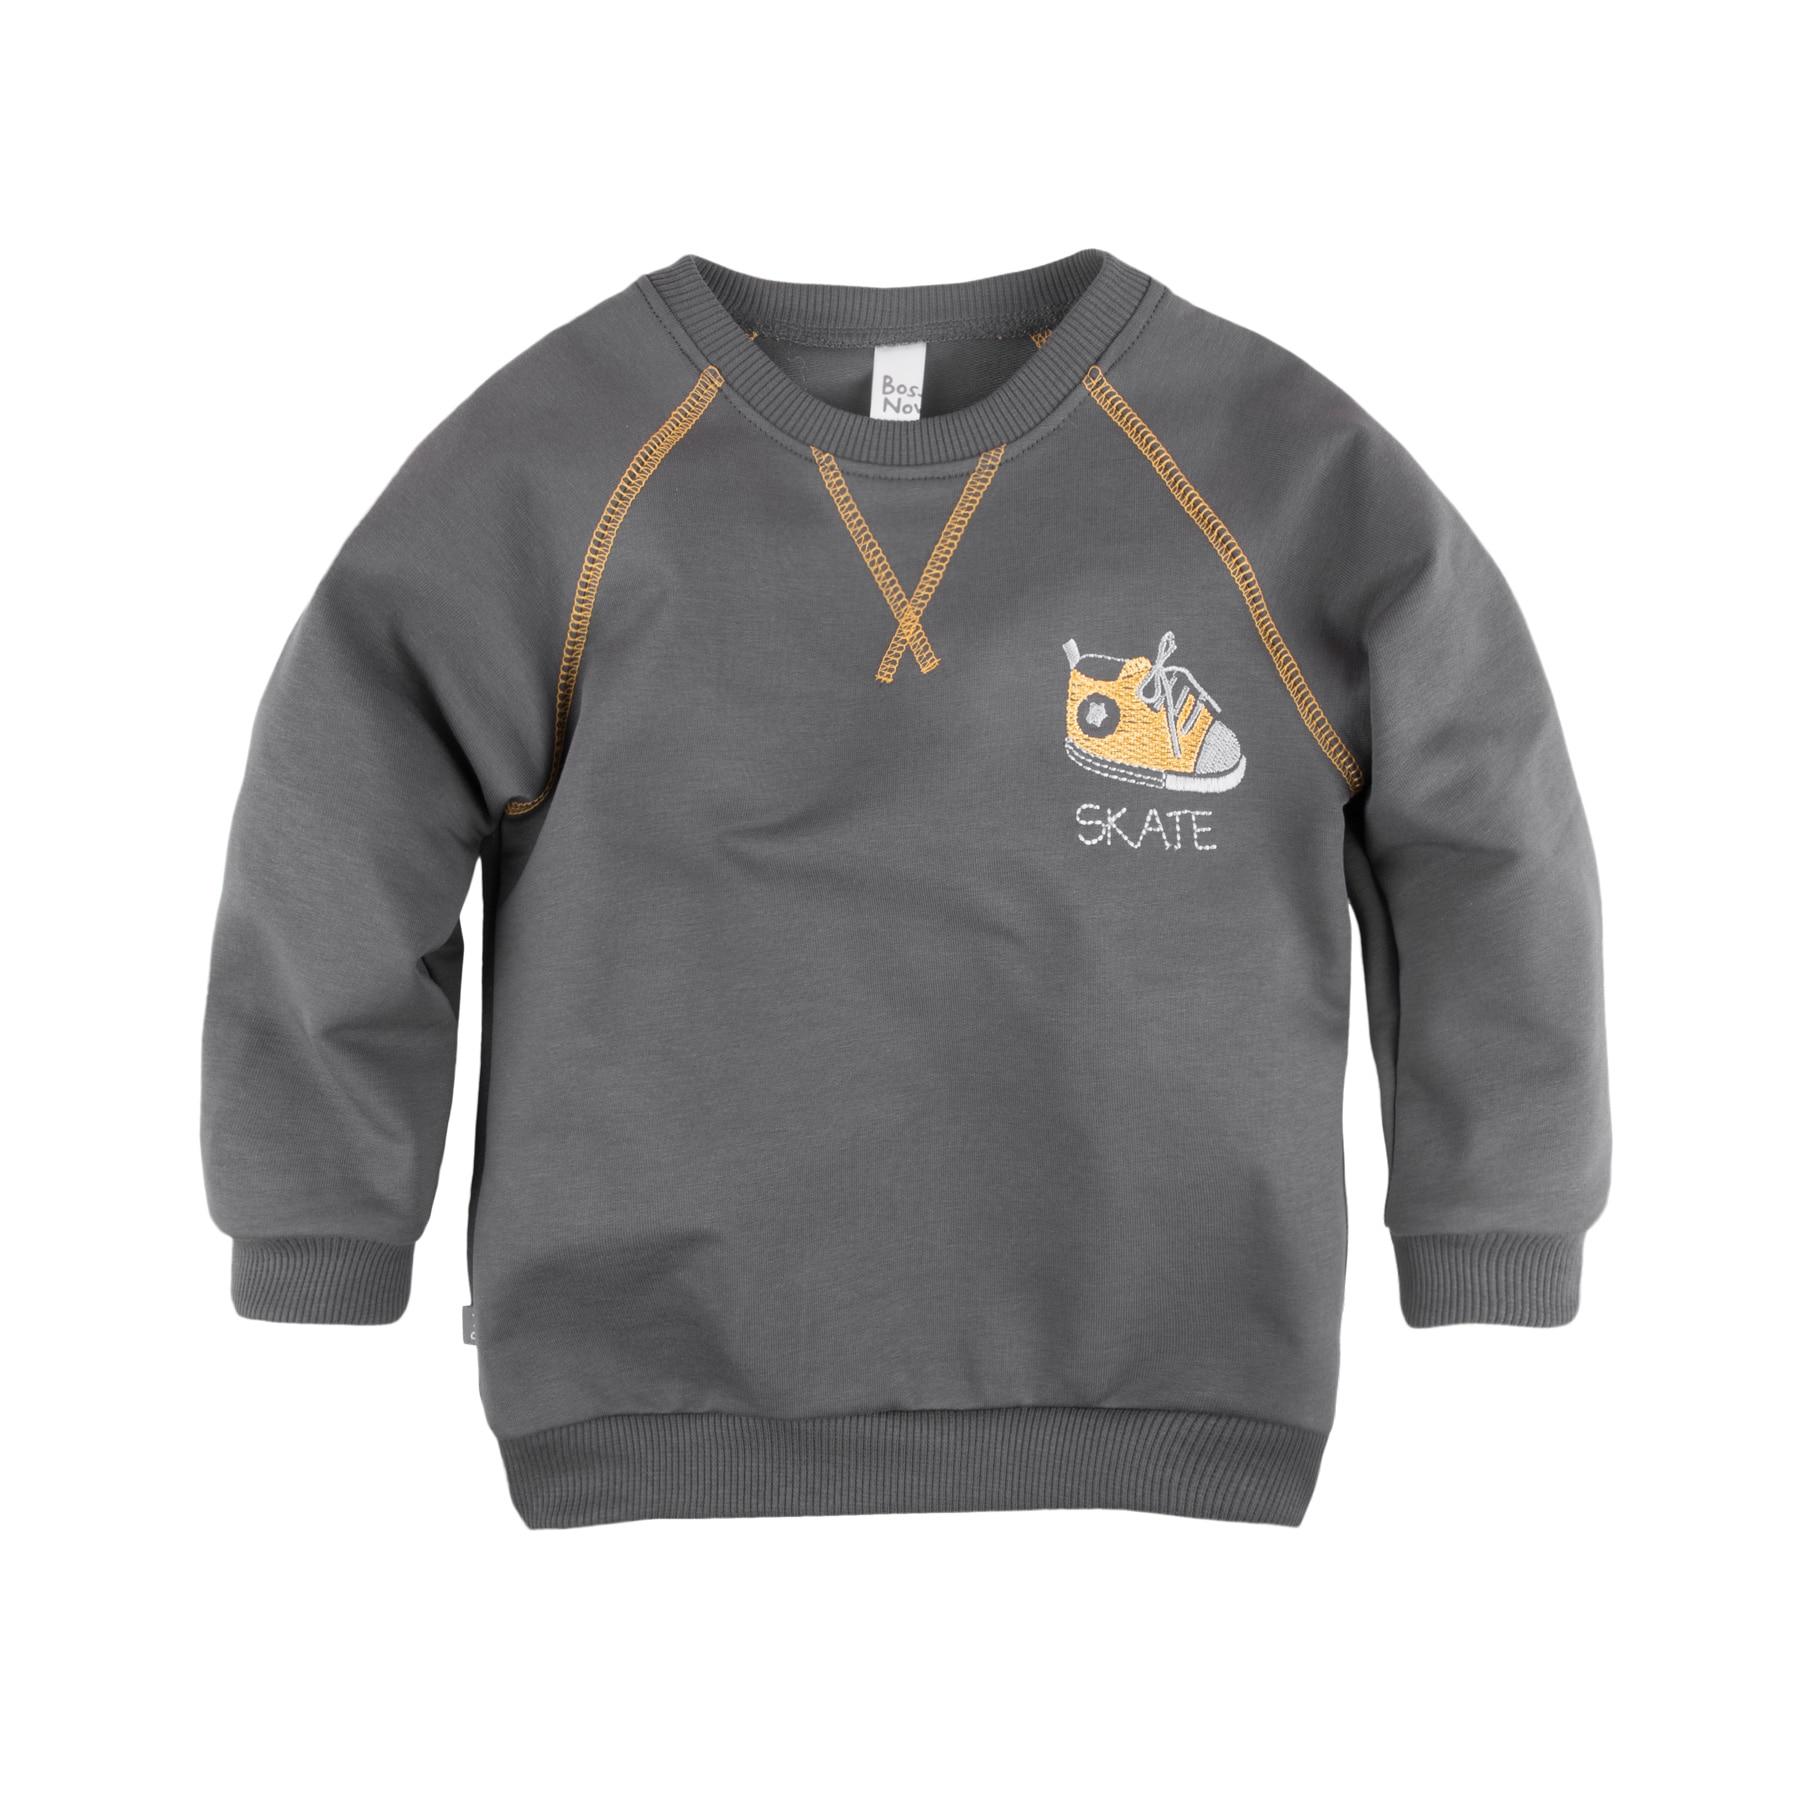 Sweatshirt for boys Bossa Nova 185B-467 kid clothes children clothing overalls for boys bossa nova 506b 351 kid clothes children clothing